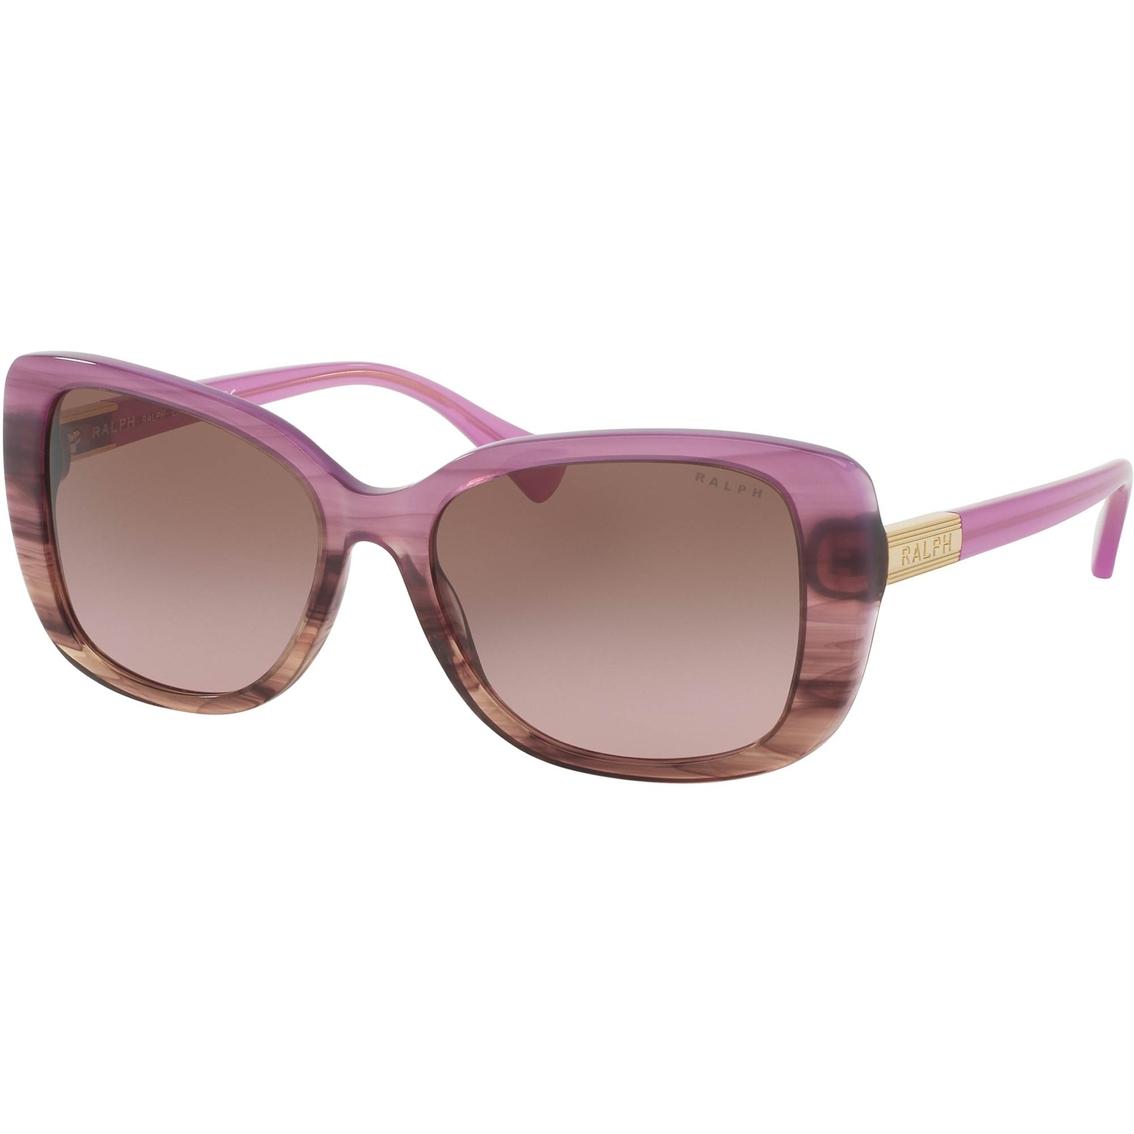 b13a17d412fe Ralph Lauren Ralph Square Sunglasses 0ra5223 | Women's Sunglasses ...